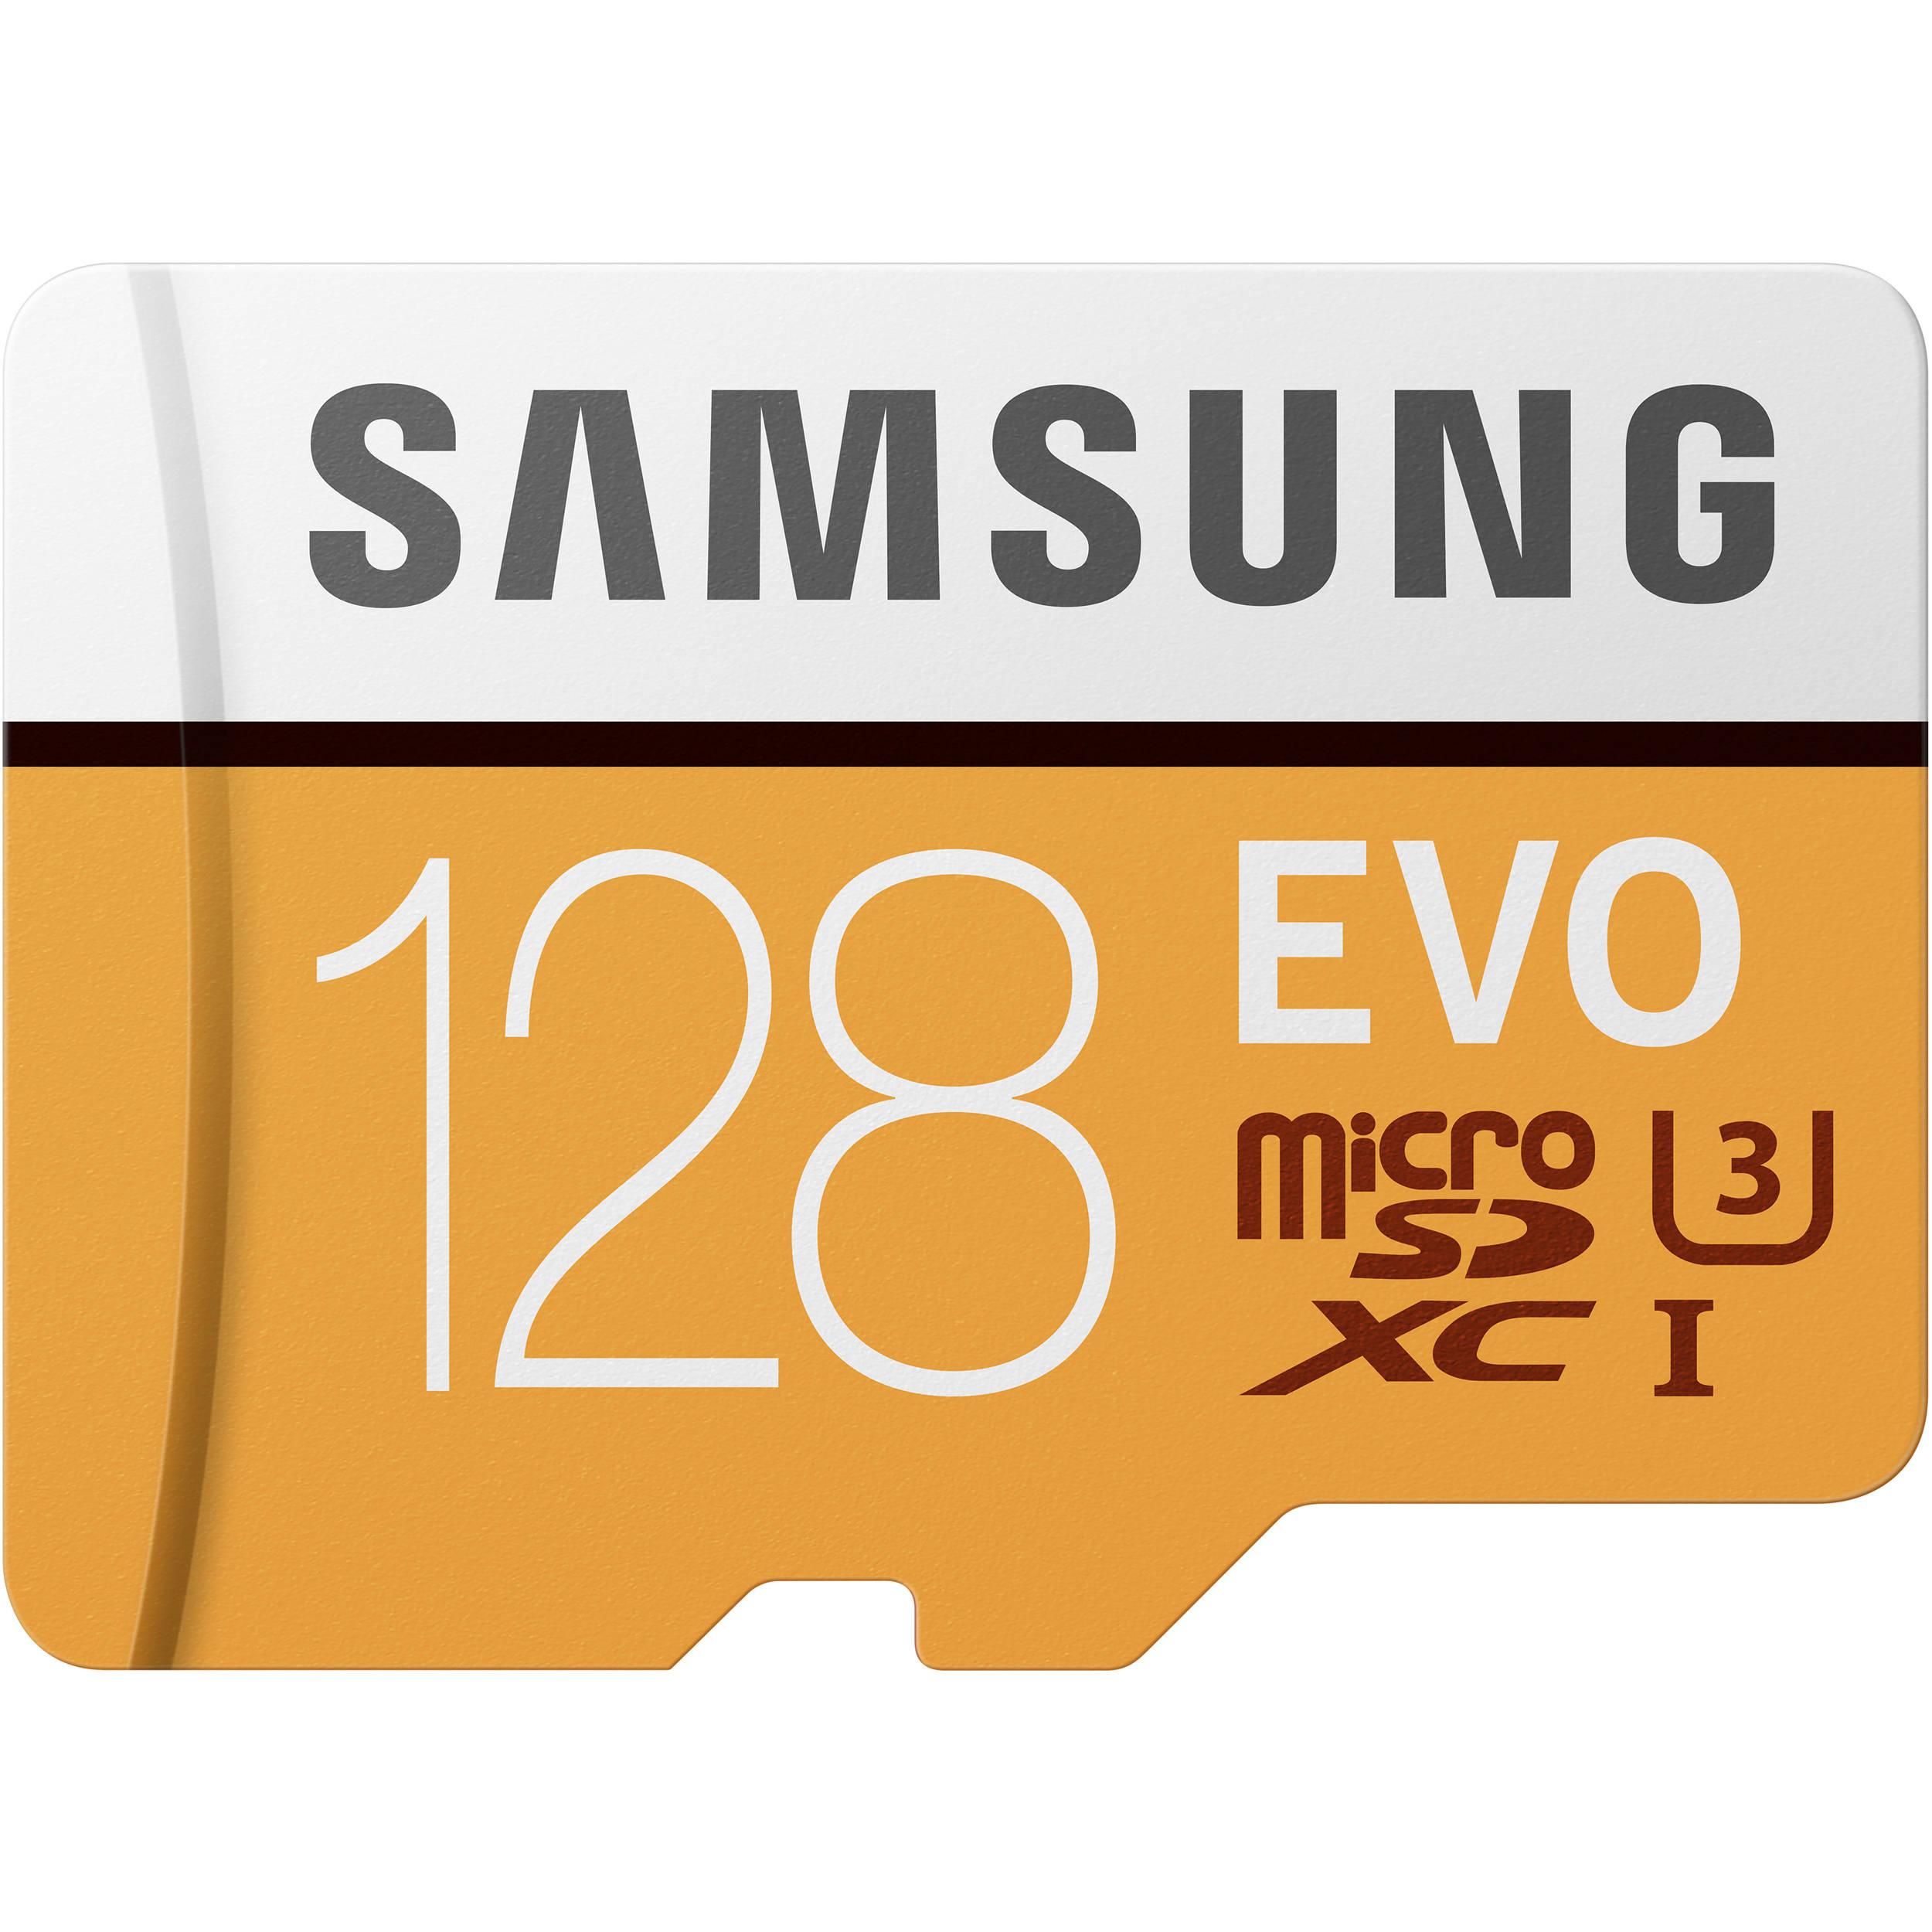 VARIOUS BRANDS 32MB SD MEMORY CARD